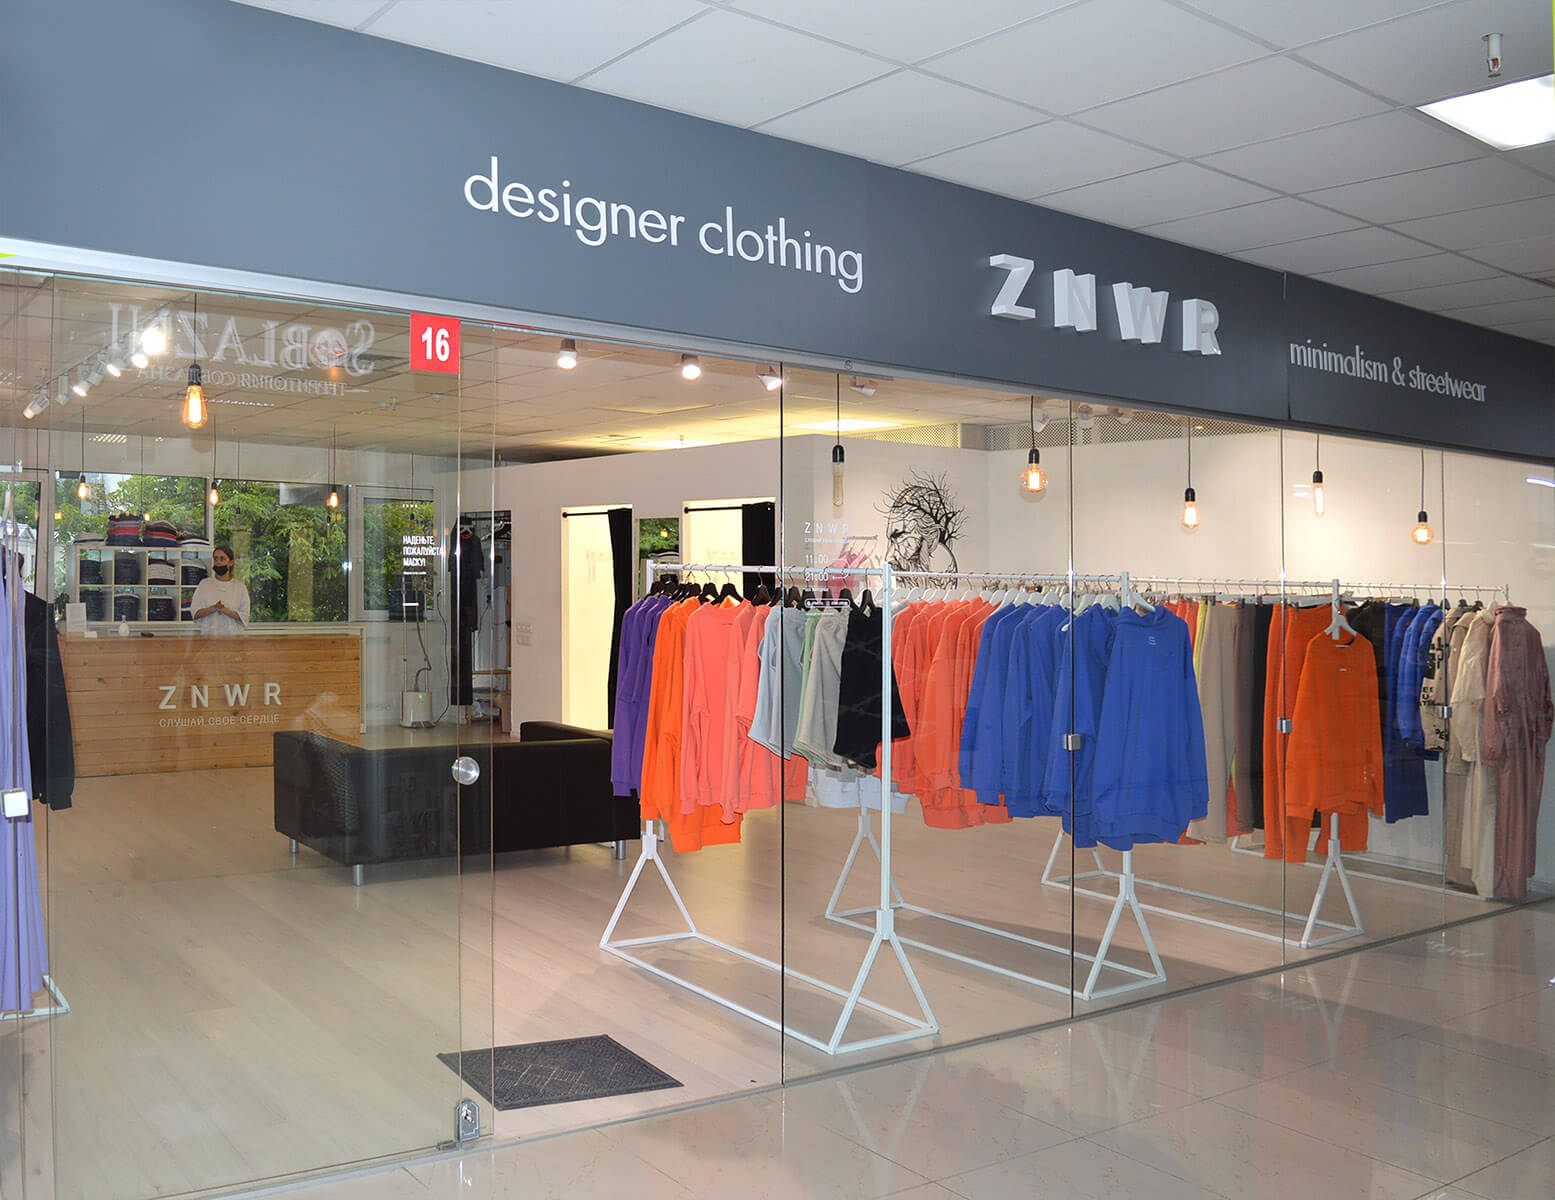 ZNWR  (ZEN wear)  - магазин дизайнерской одежды стиля минимализм